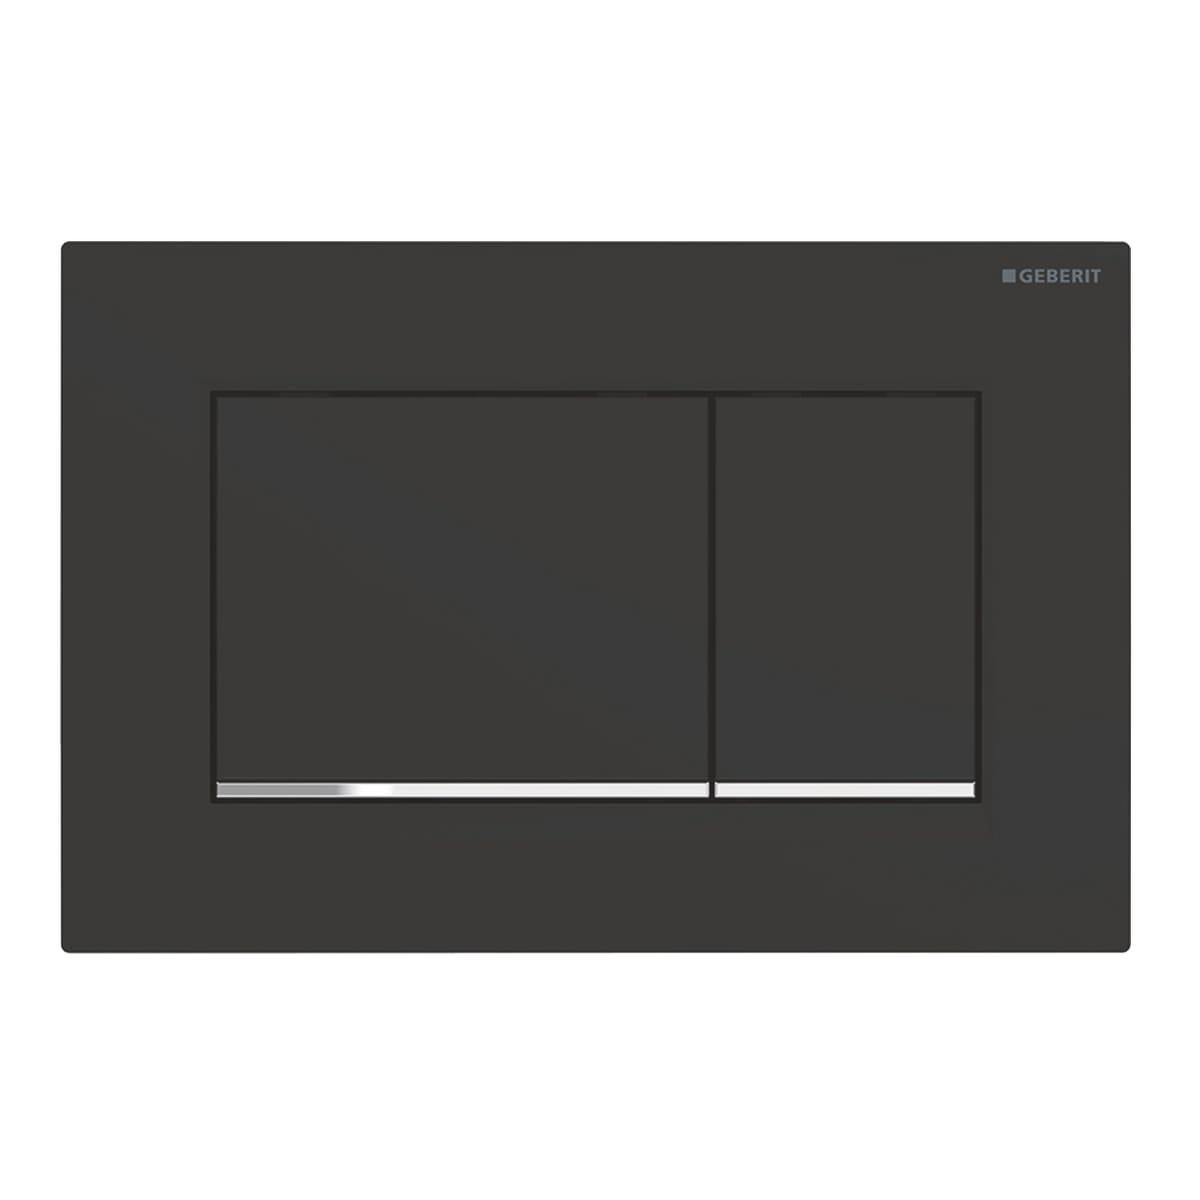 Geberit Sigma 30 drukplaat DF mat zwart t.b.v. Sigma Up reservoir